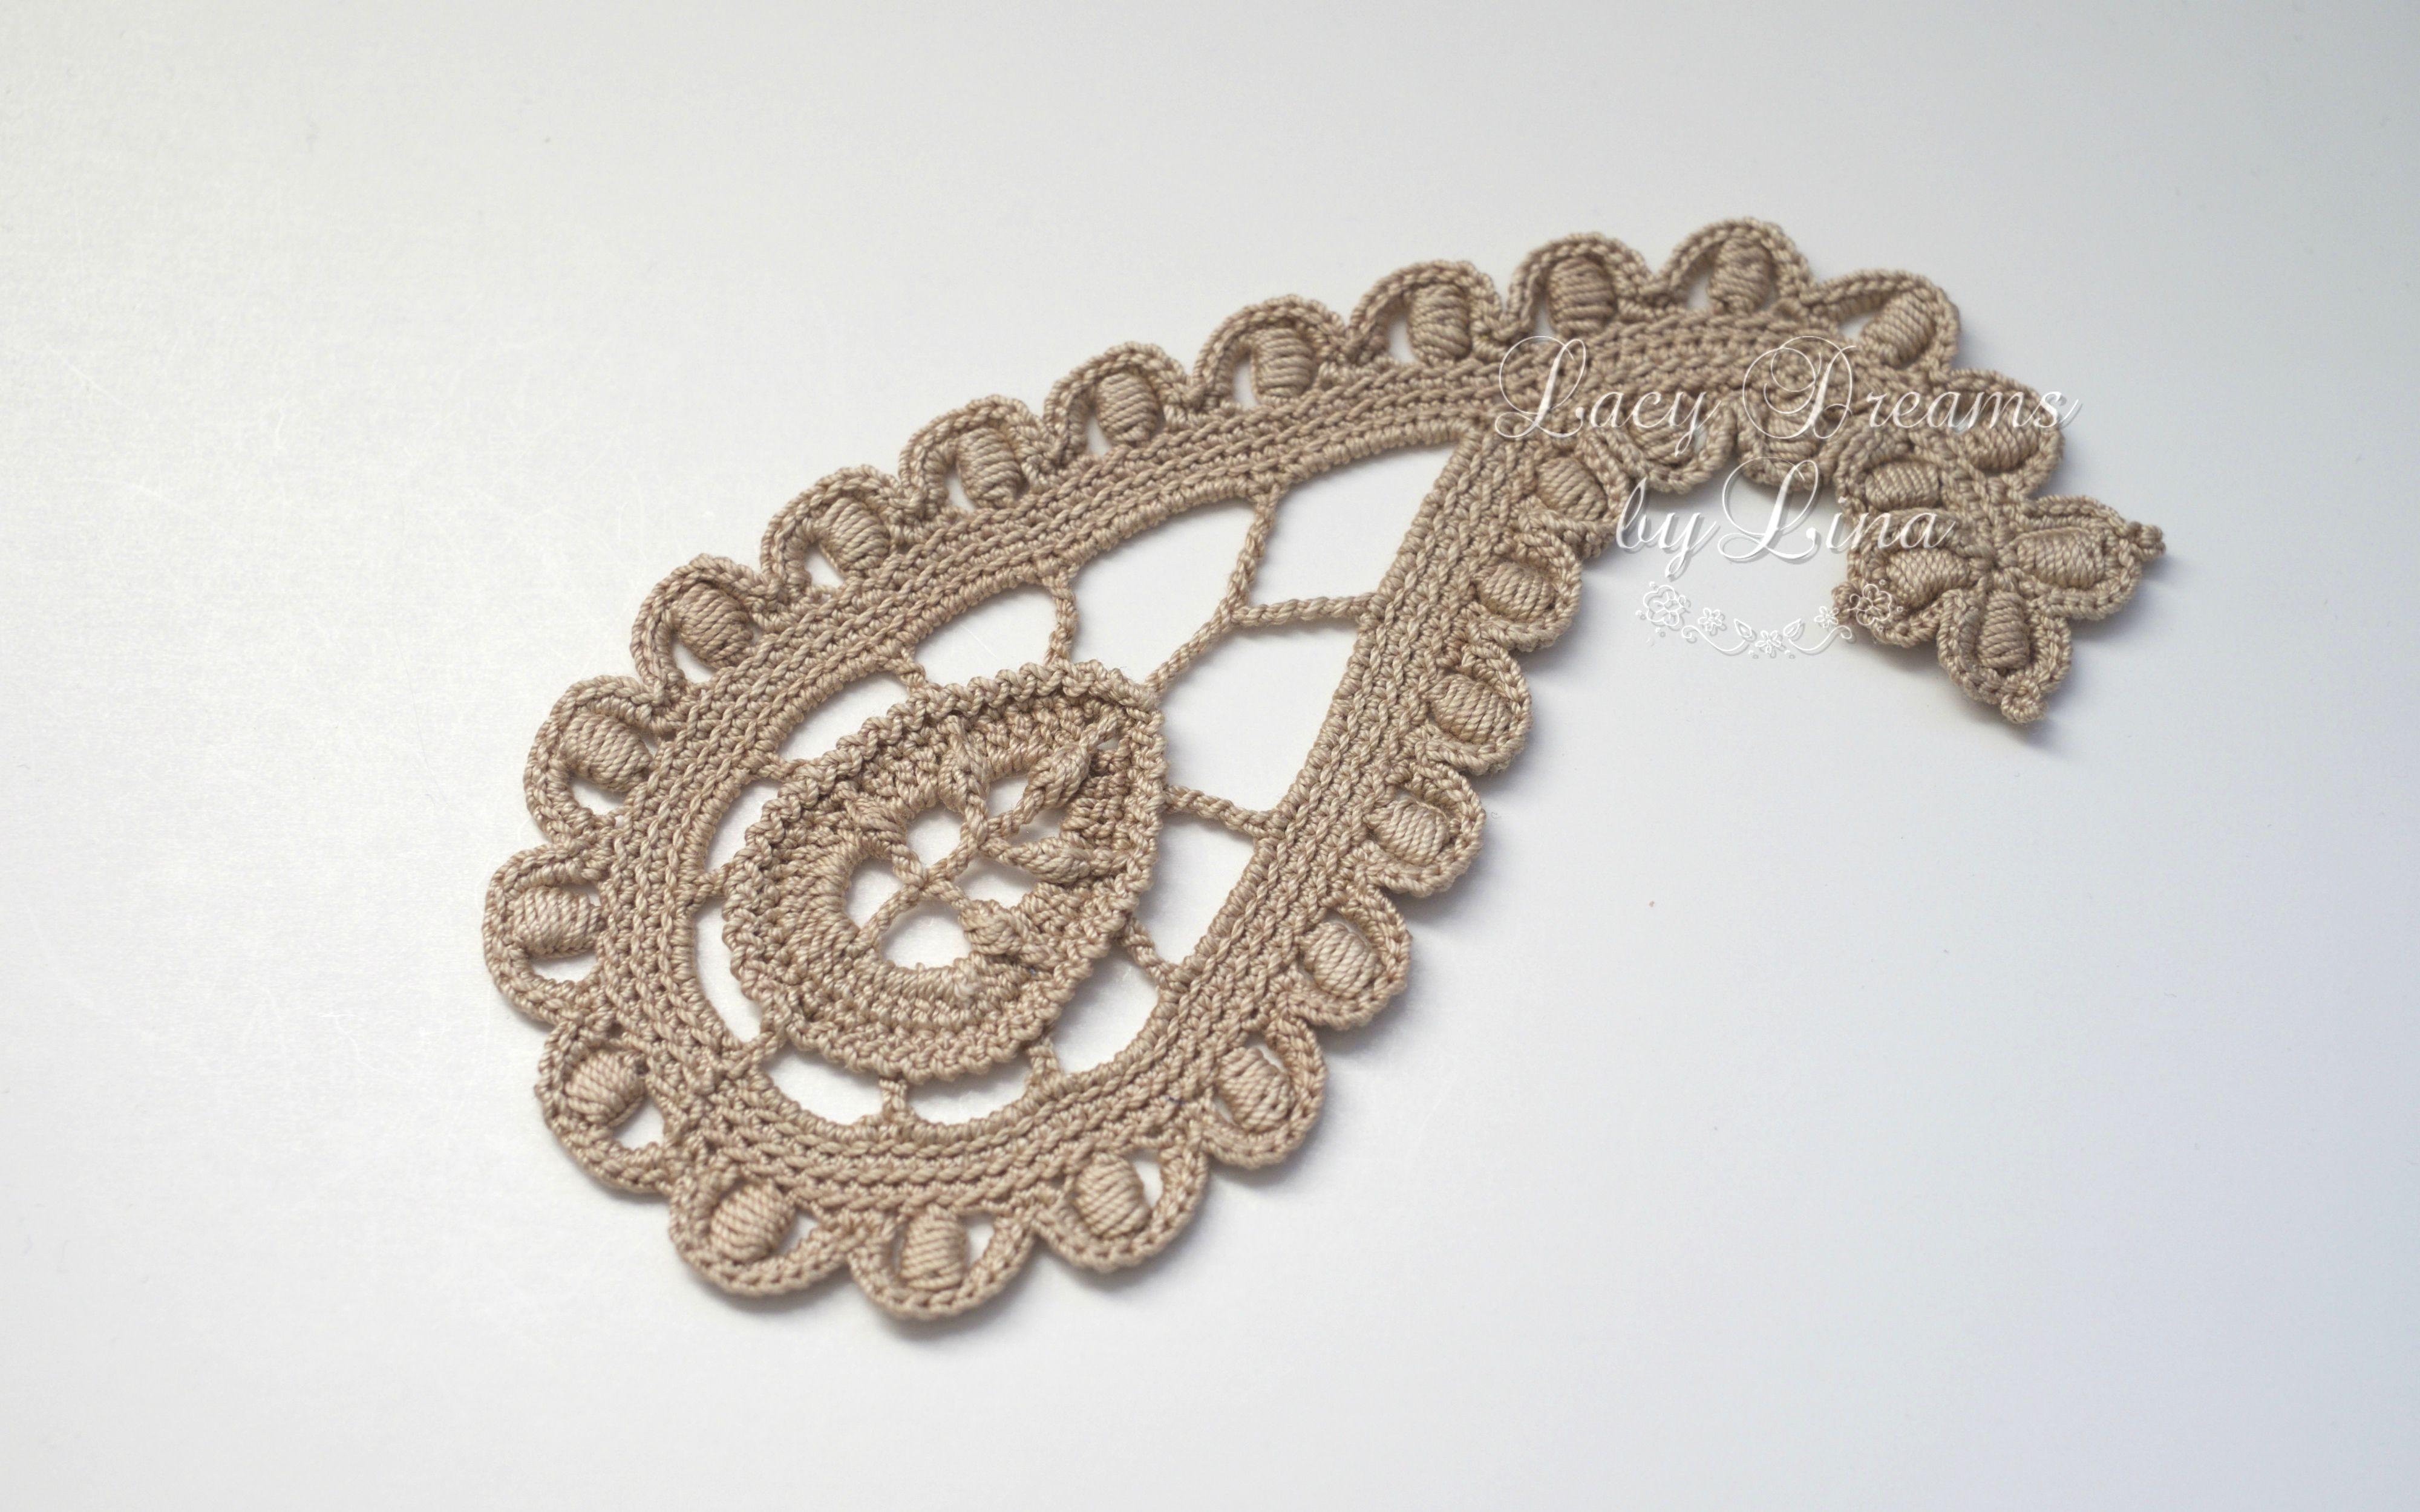 Crochet Paisley Pattern On Irishcrochetlab Crochet Motif Irish